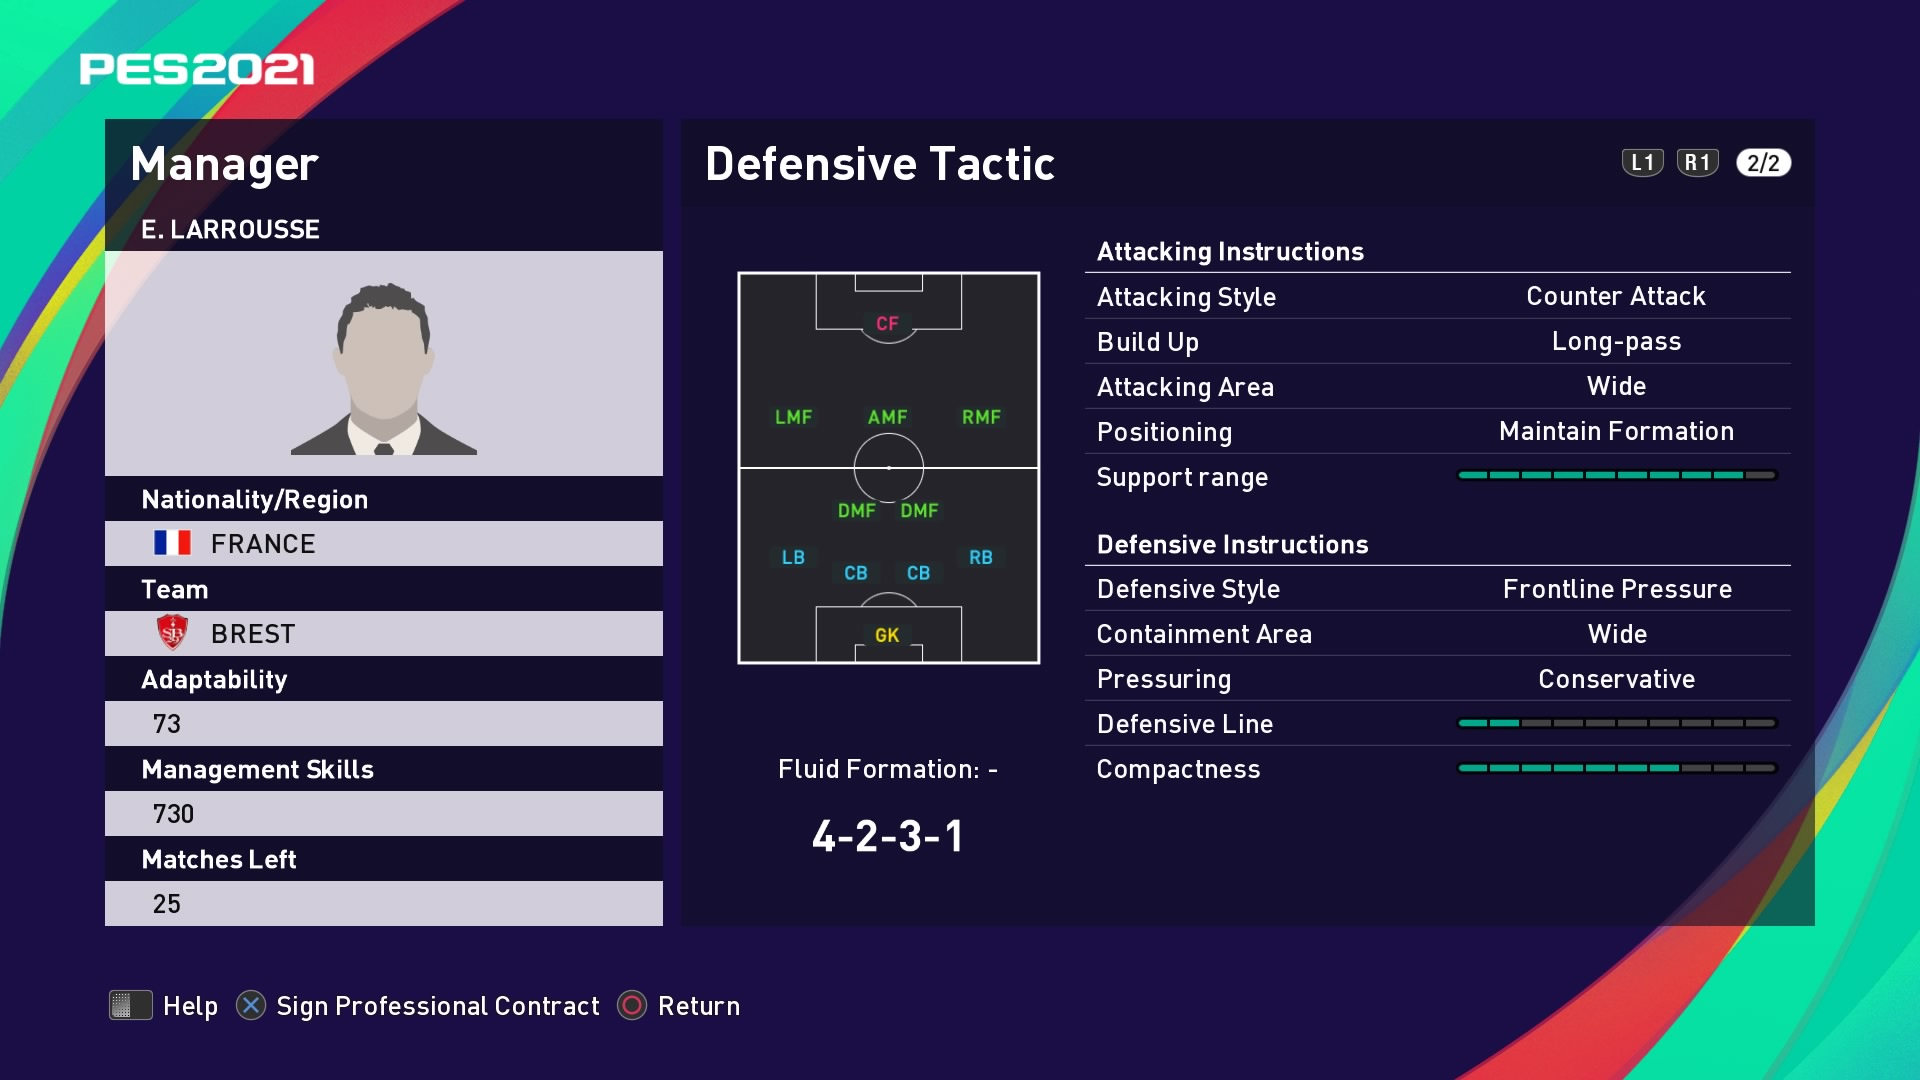 E. Larrousse (Olivier Dall'Oglio) Defensive Tactic in PES 2021 myClub